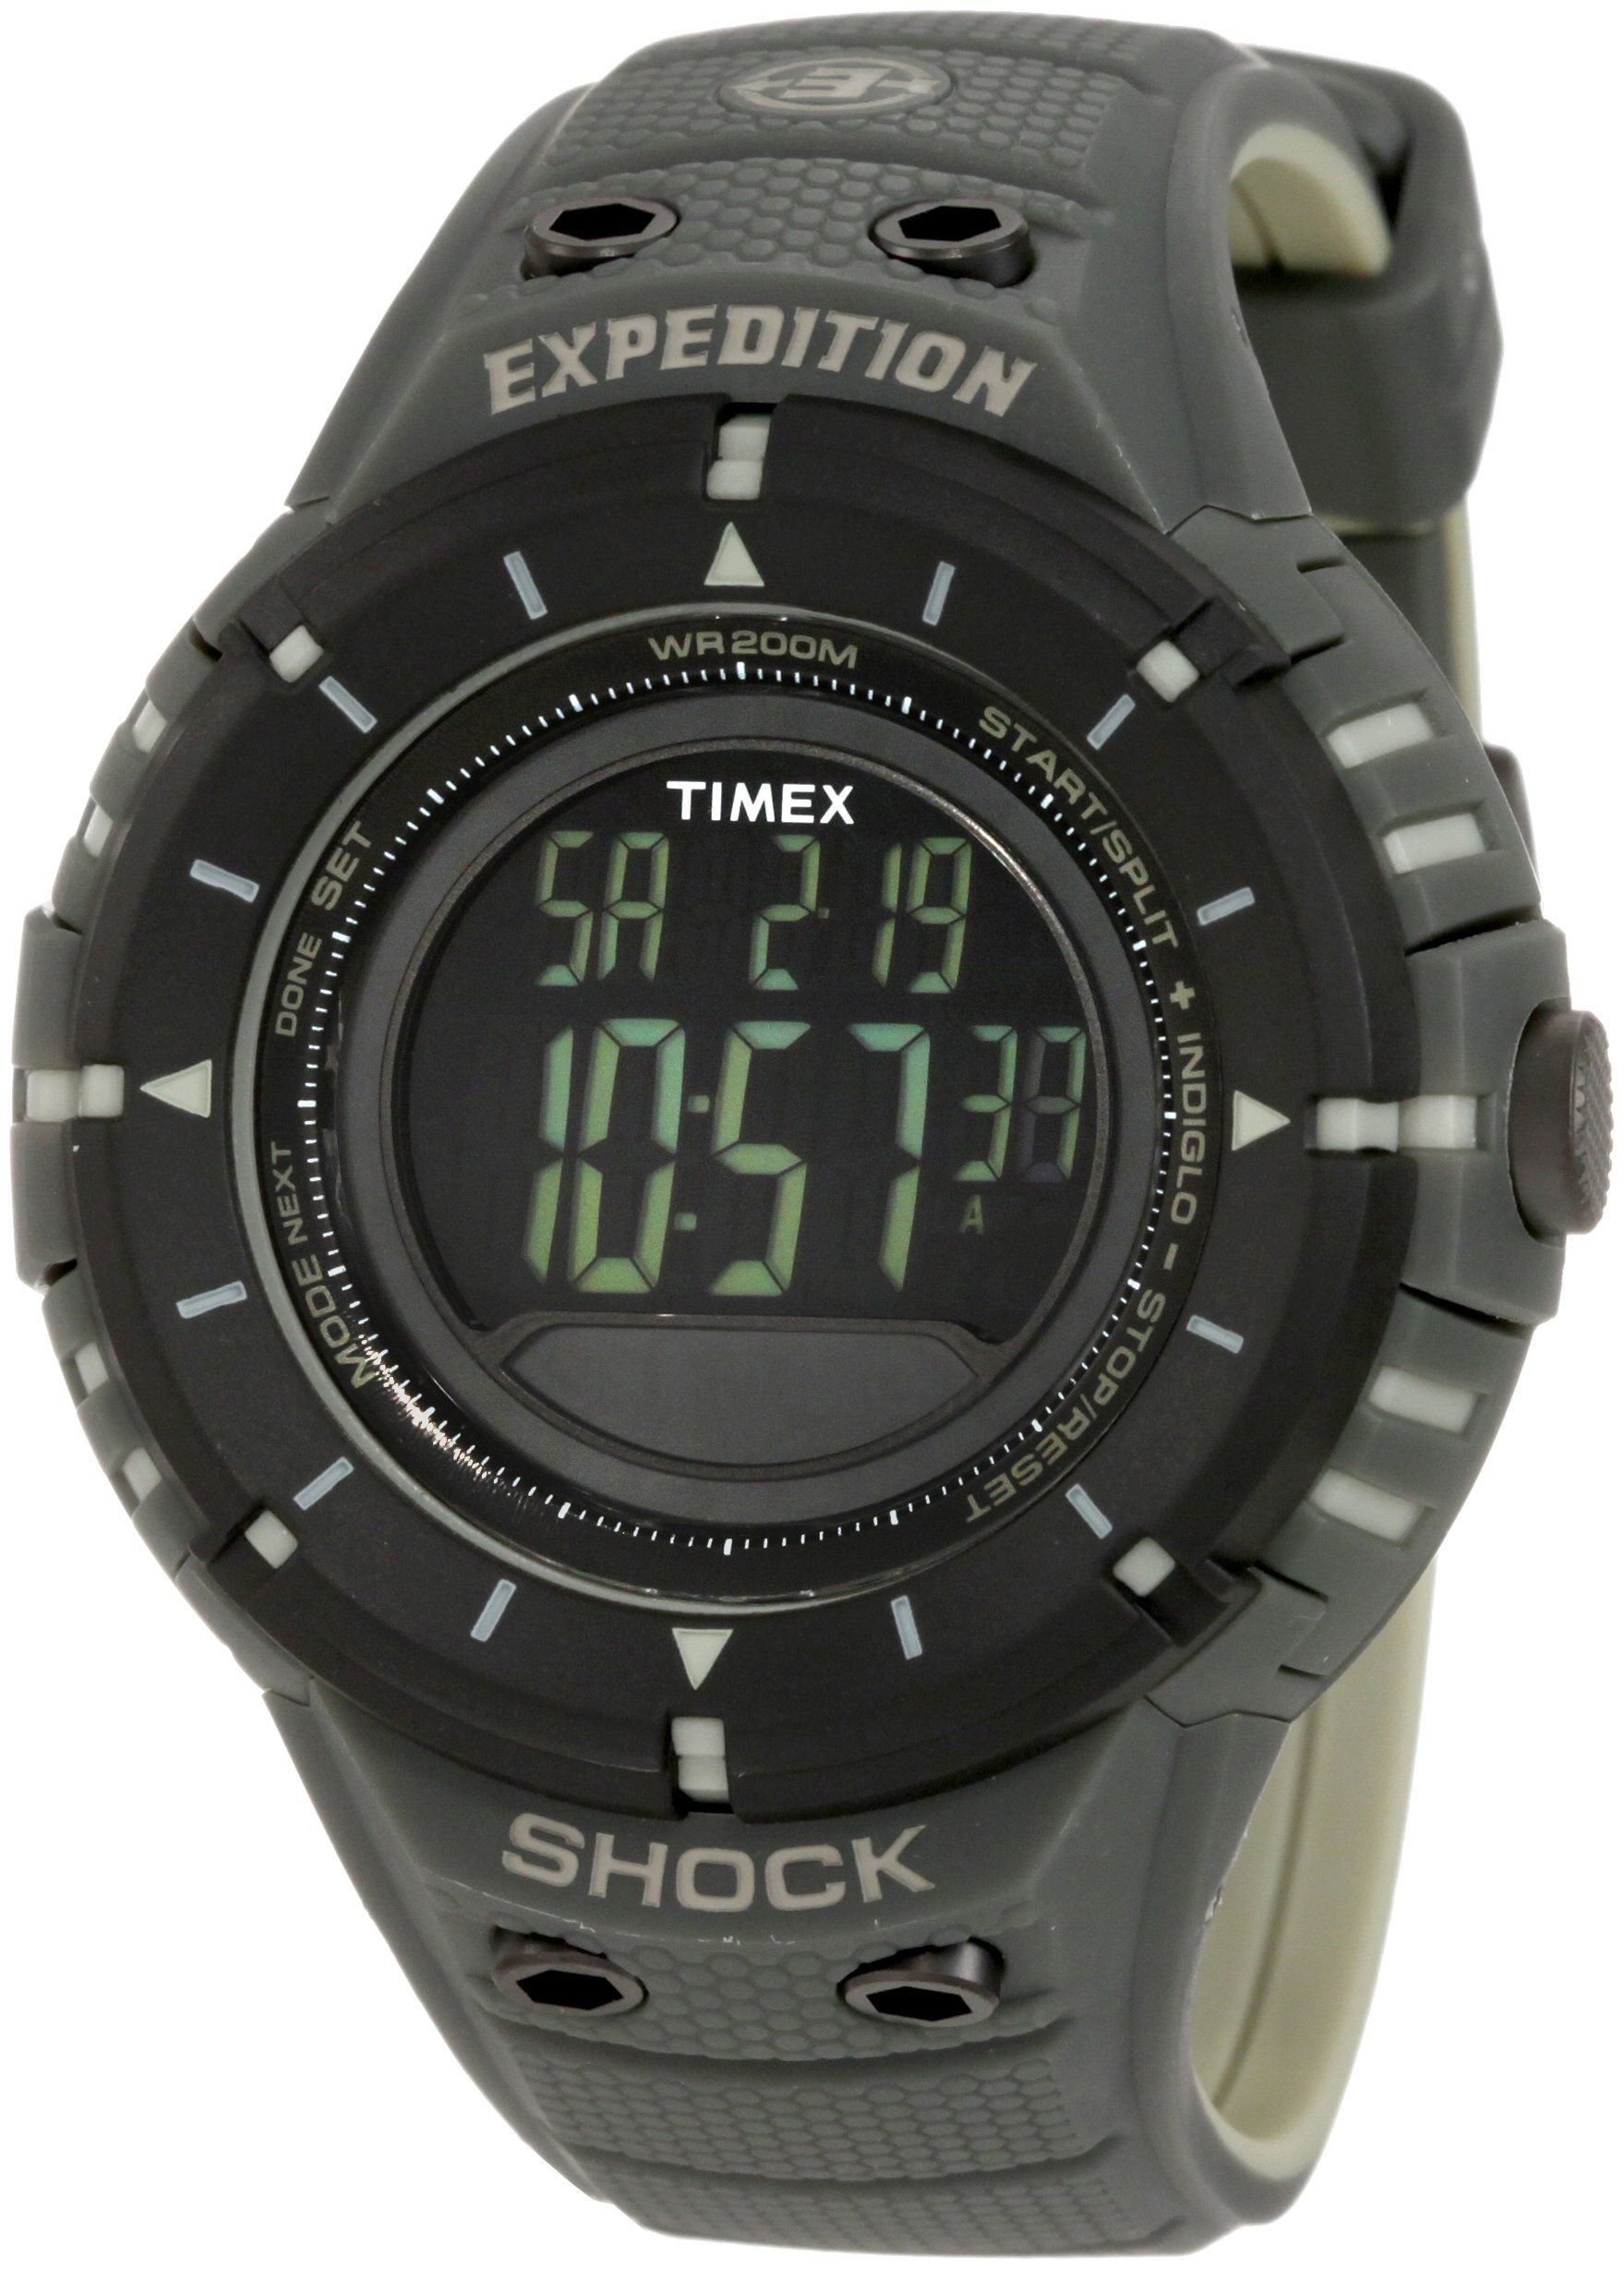 6b03df976a1a Amazon.com  Timex Men s T49612